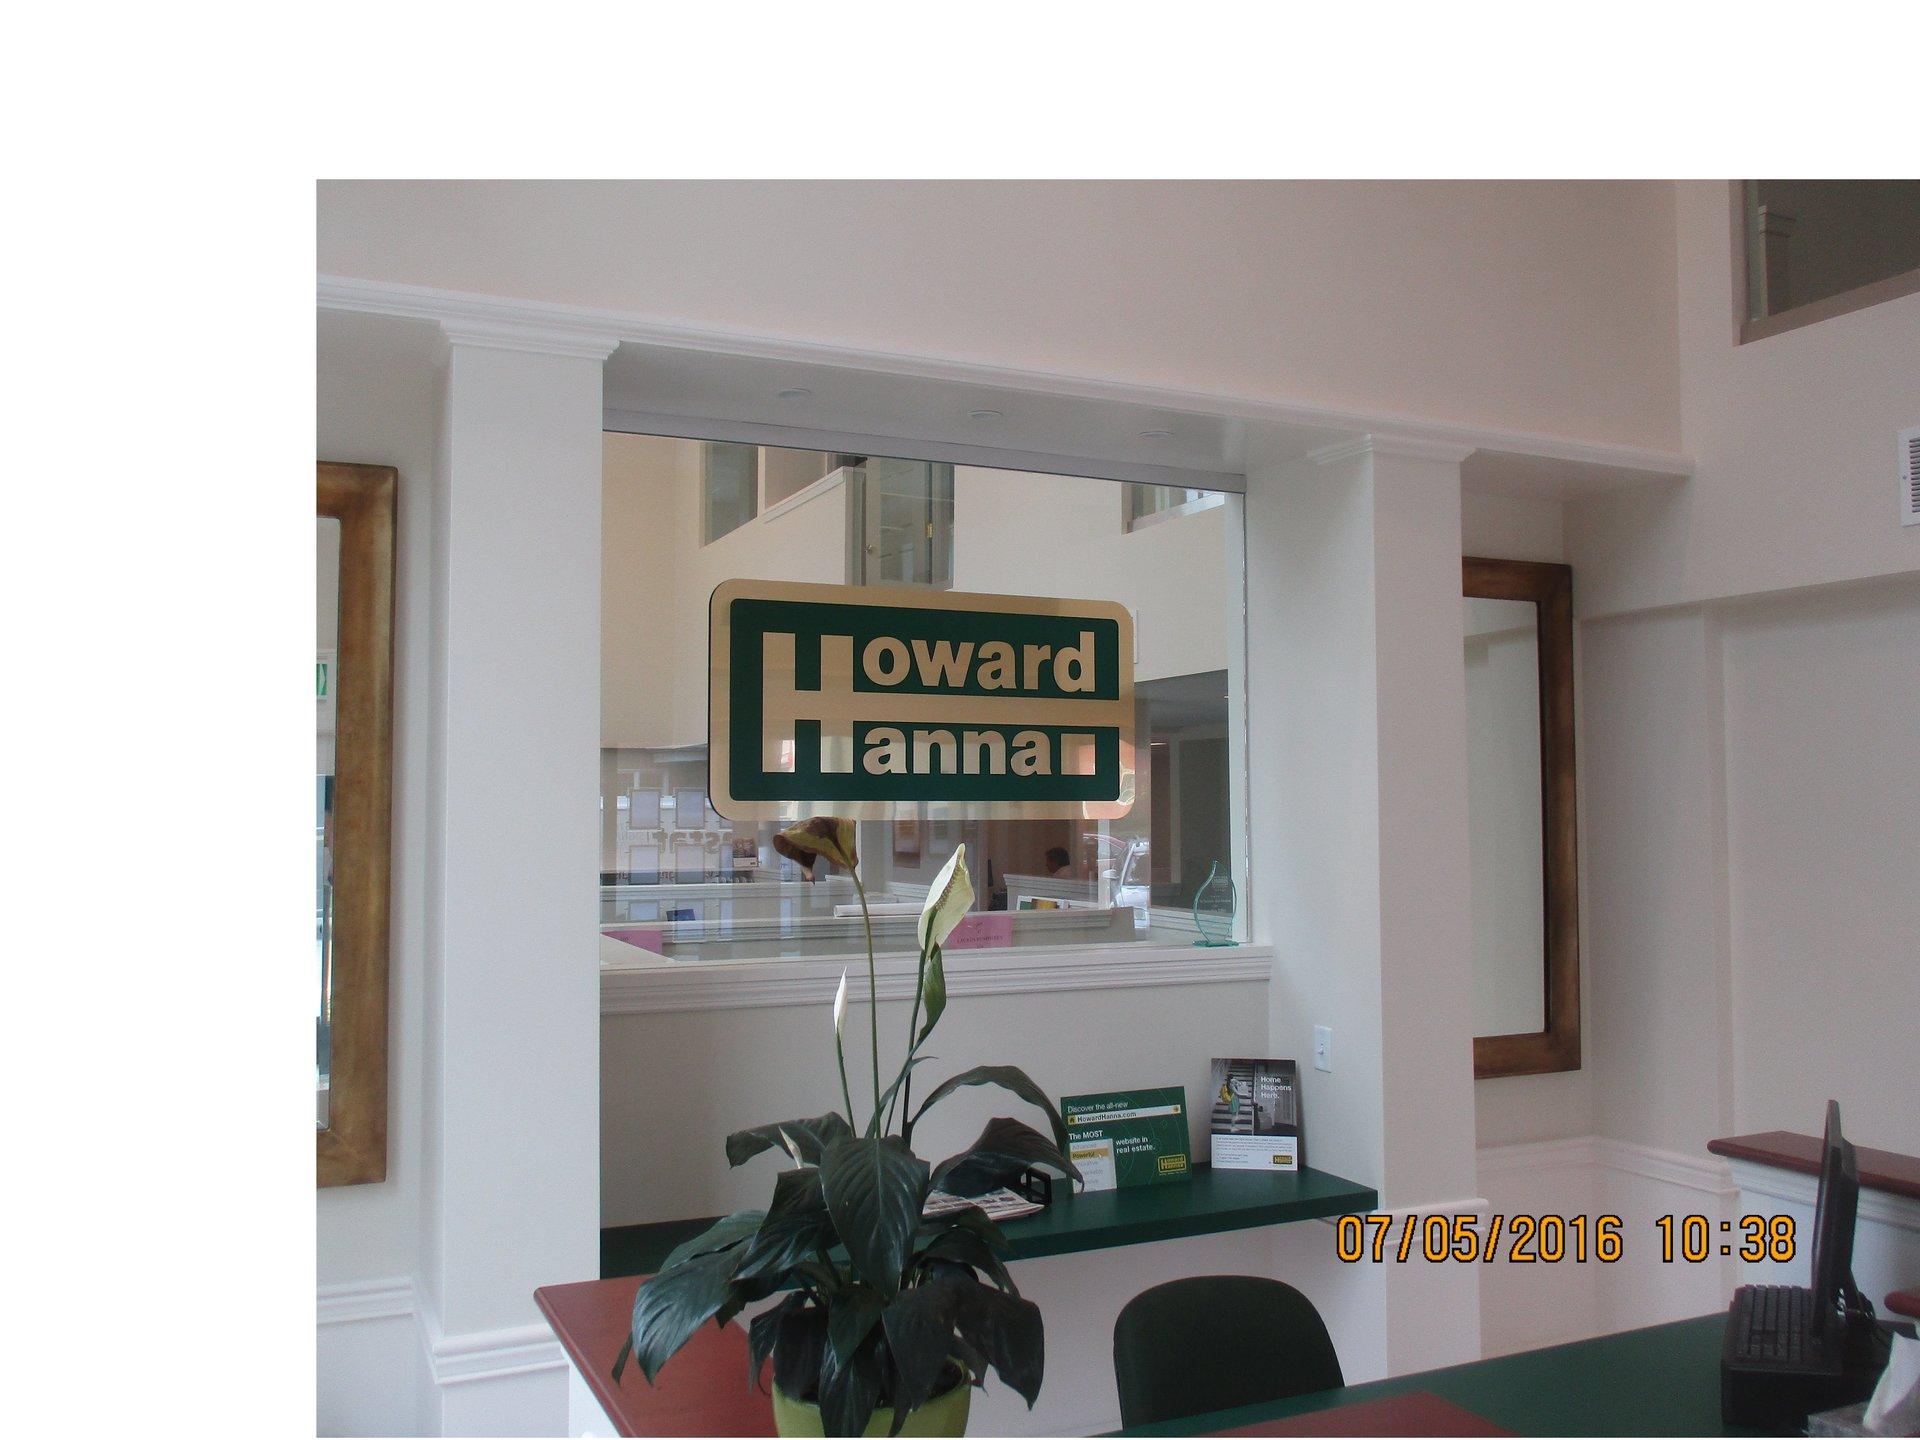 Interior wayfinding signs